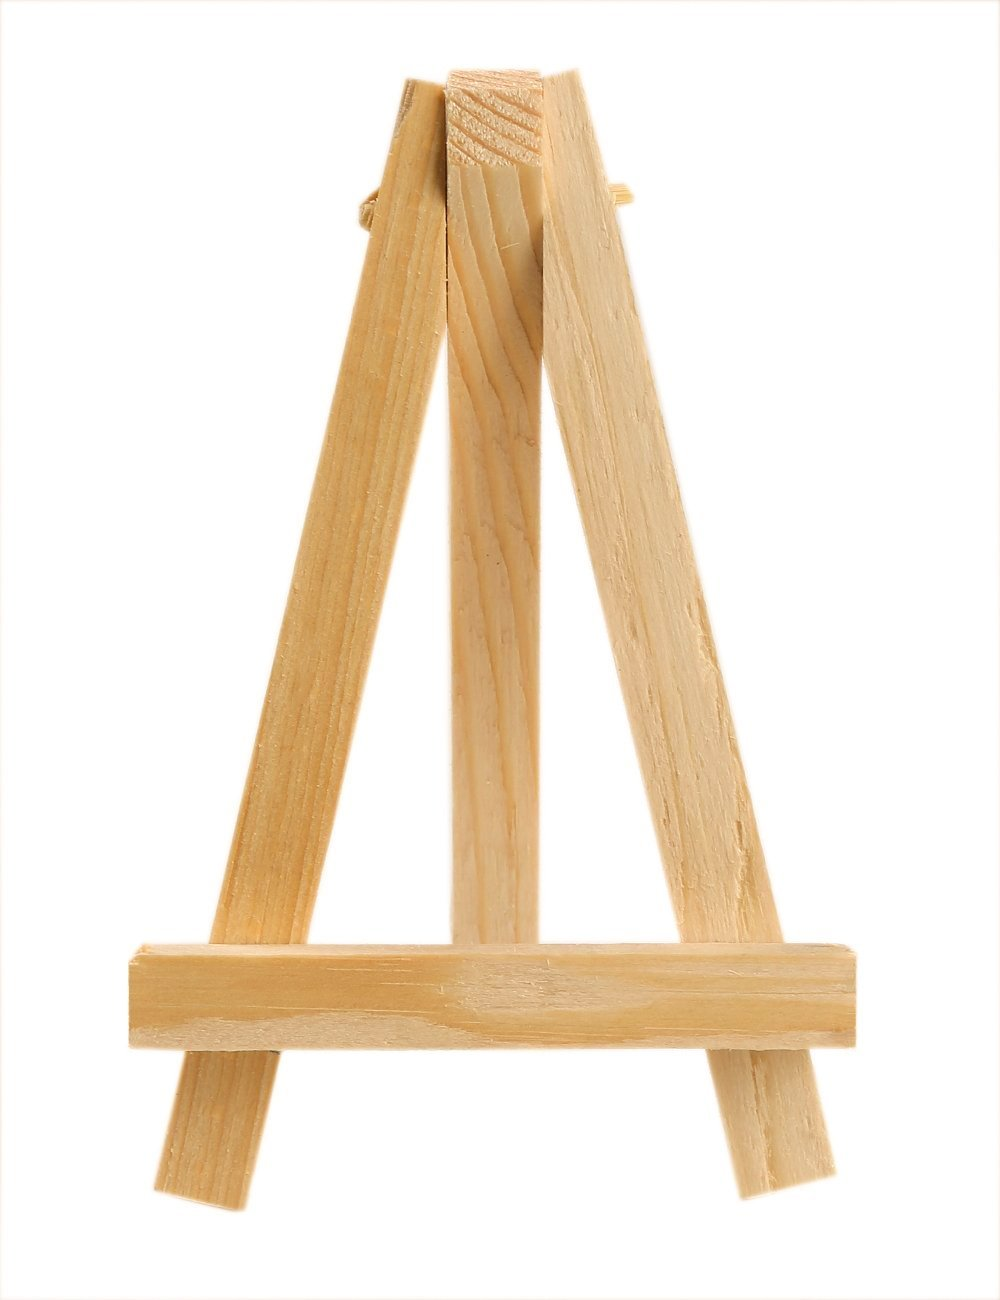 Meeden 24pcs Wooden Easel Pine Wood Art Display Painting